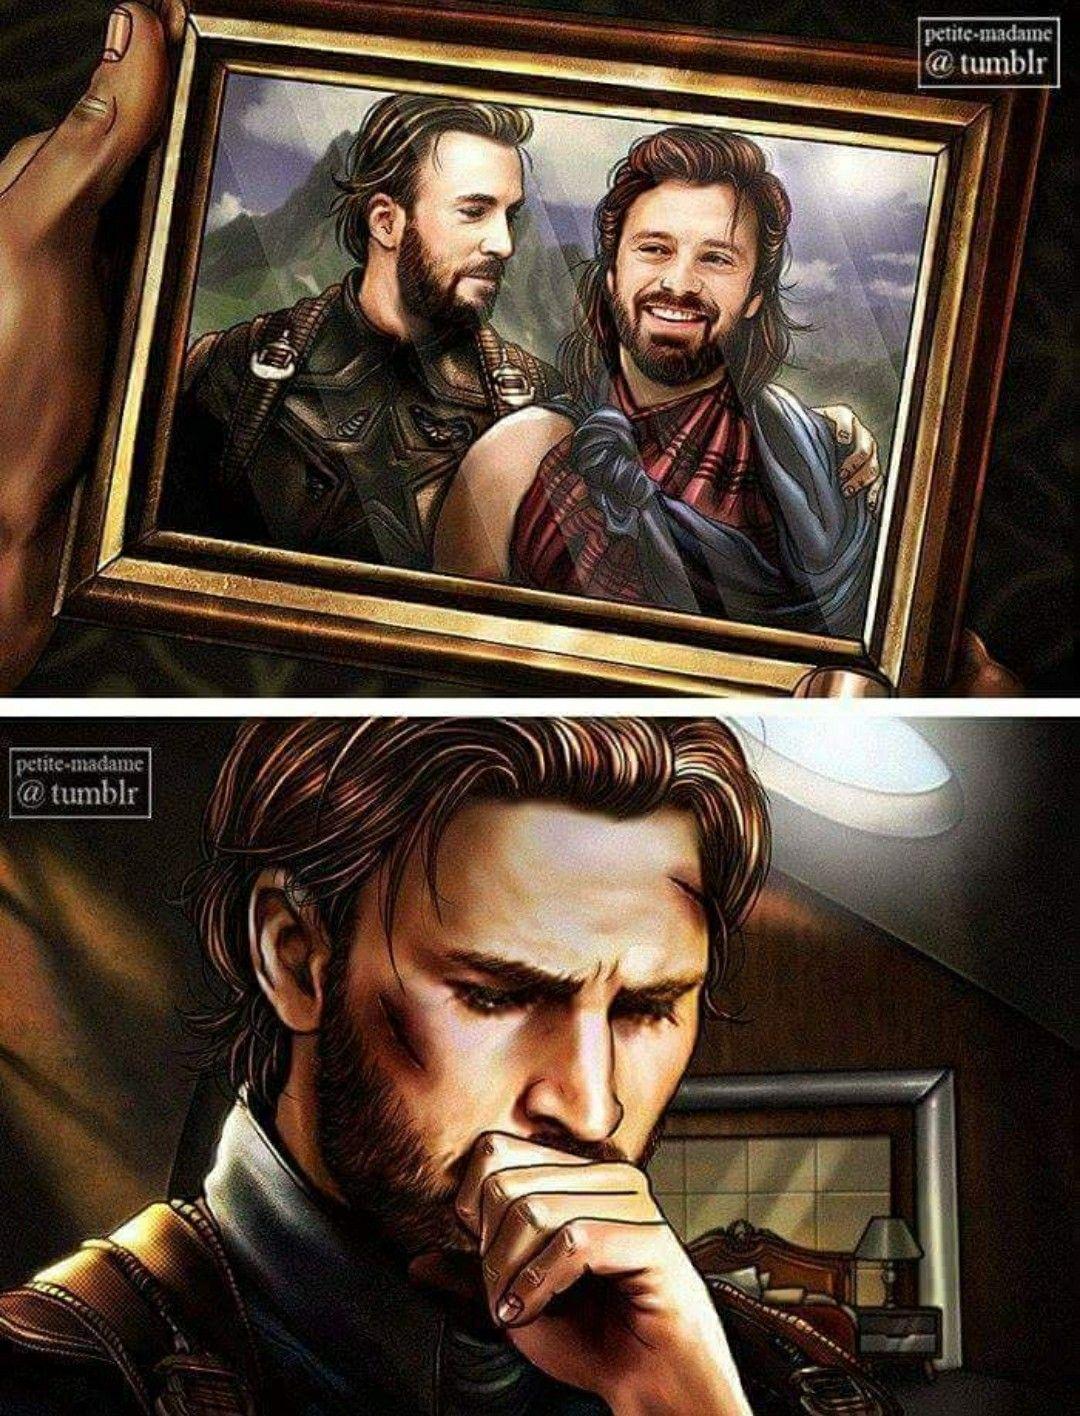 Aftermath of Avengers Infinity War: Steve losing his best friend